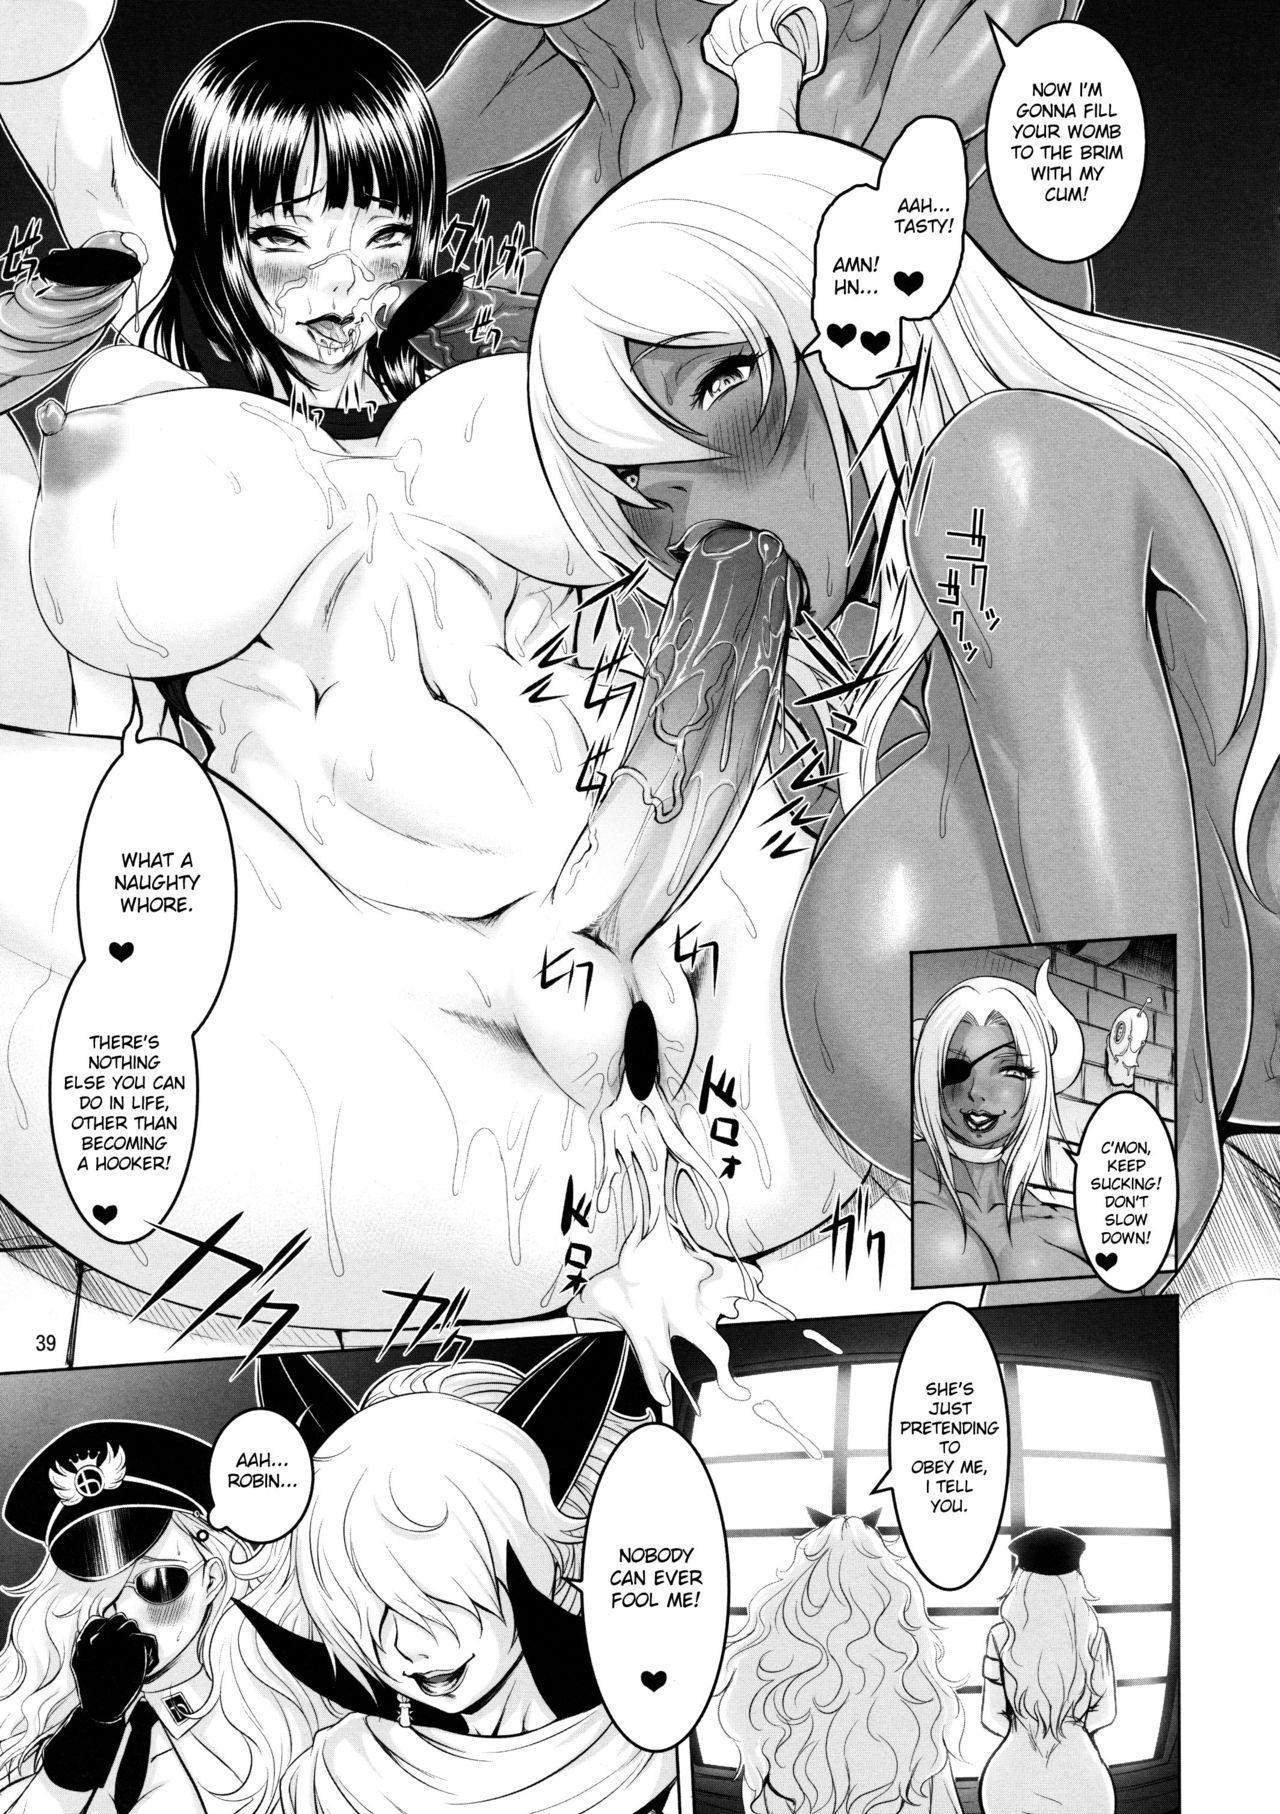 Midare Saki Joshuu Kaizoku Soushuuhen   Bloom, Pirate Hooker! Bloom! Annual 36